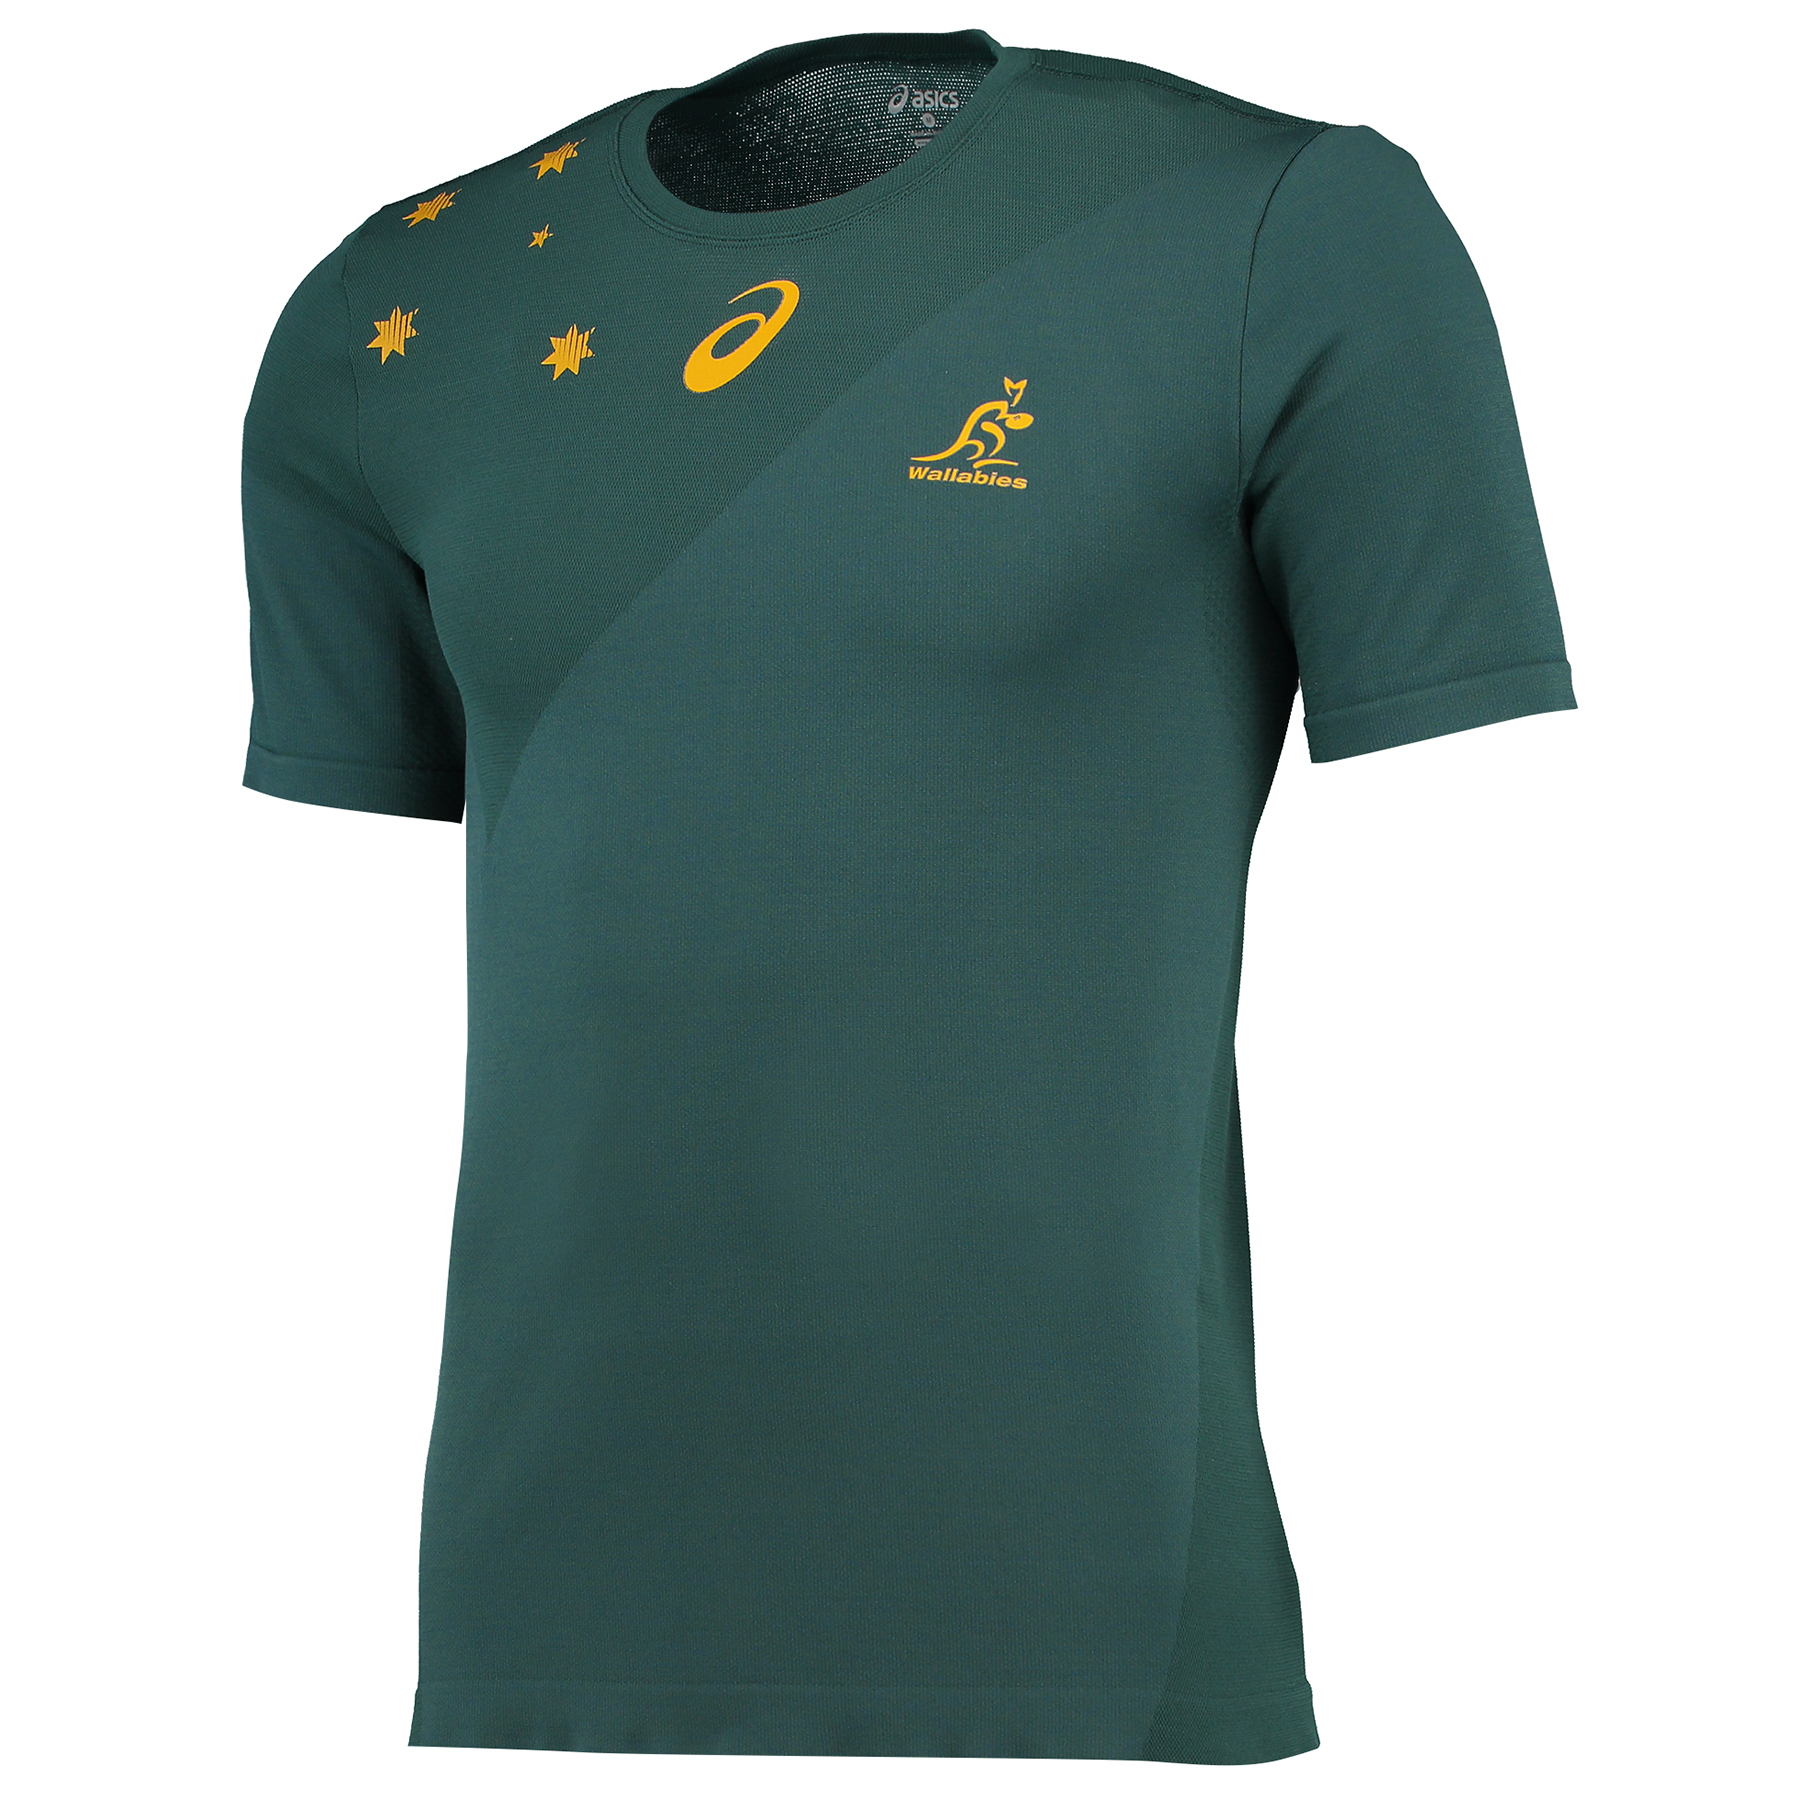 Australia Wallabies Rugby Match Day Training TShirt Green